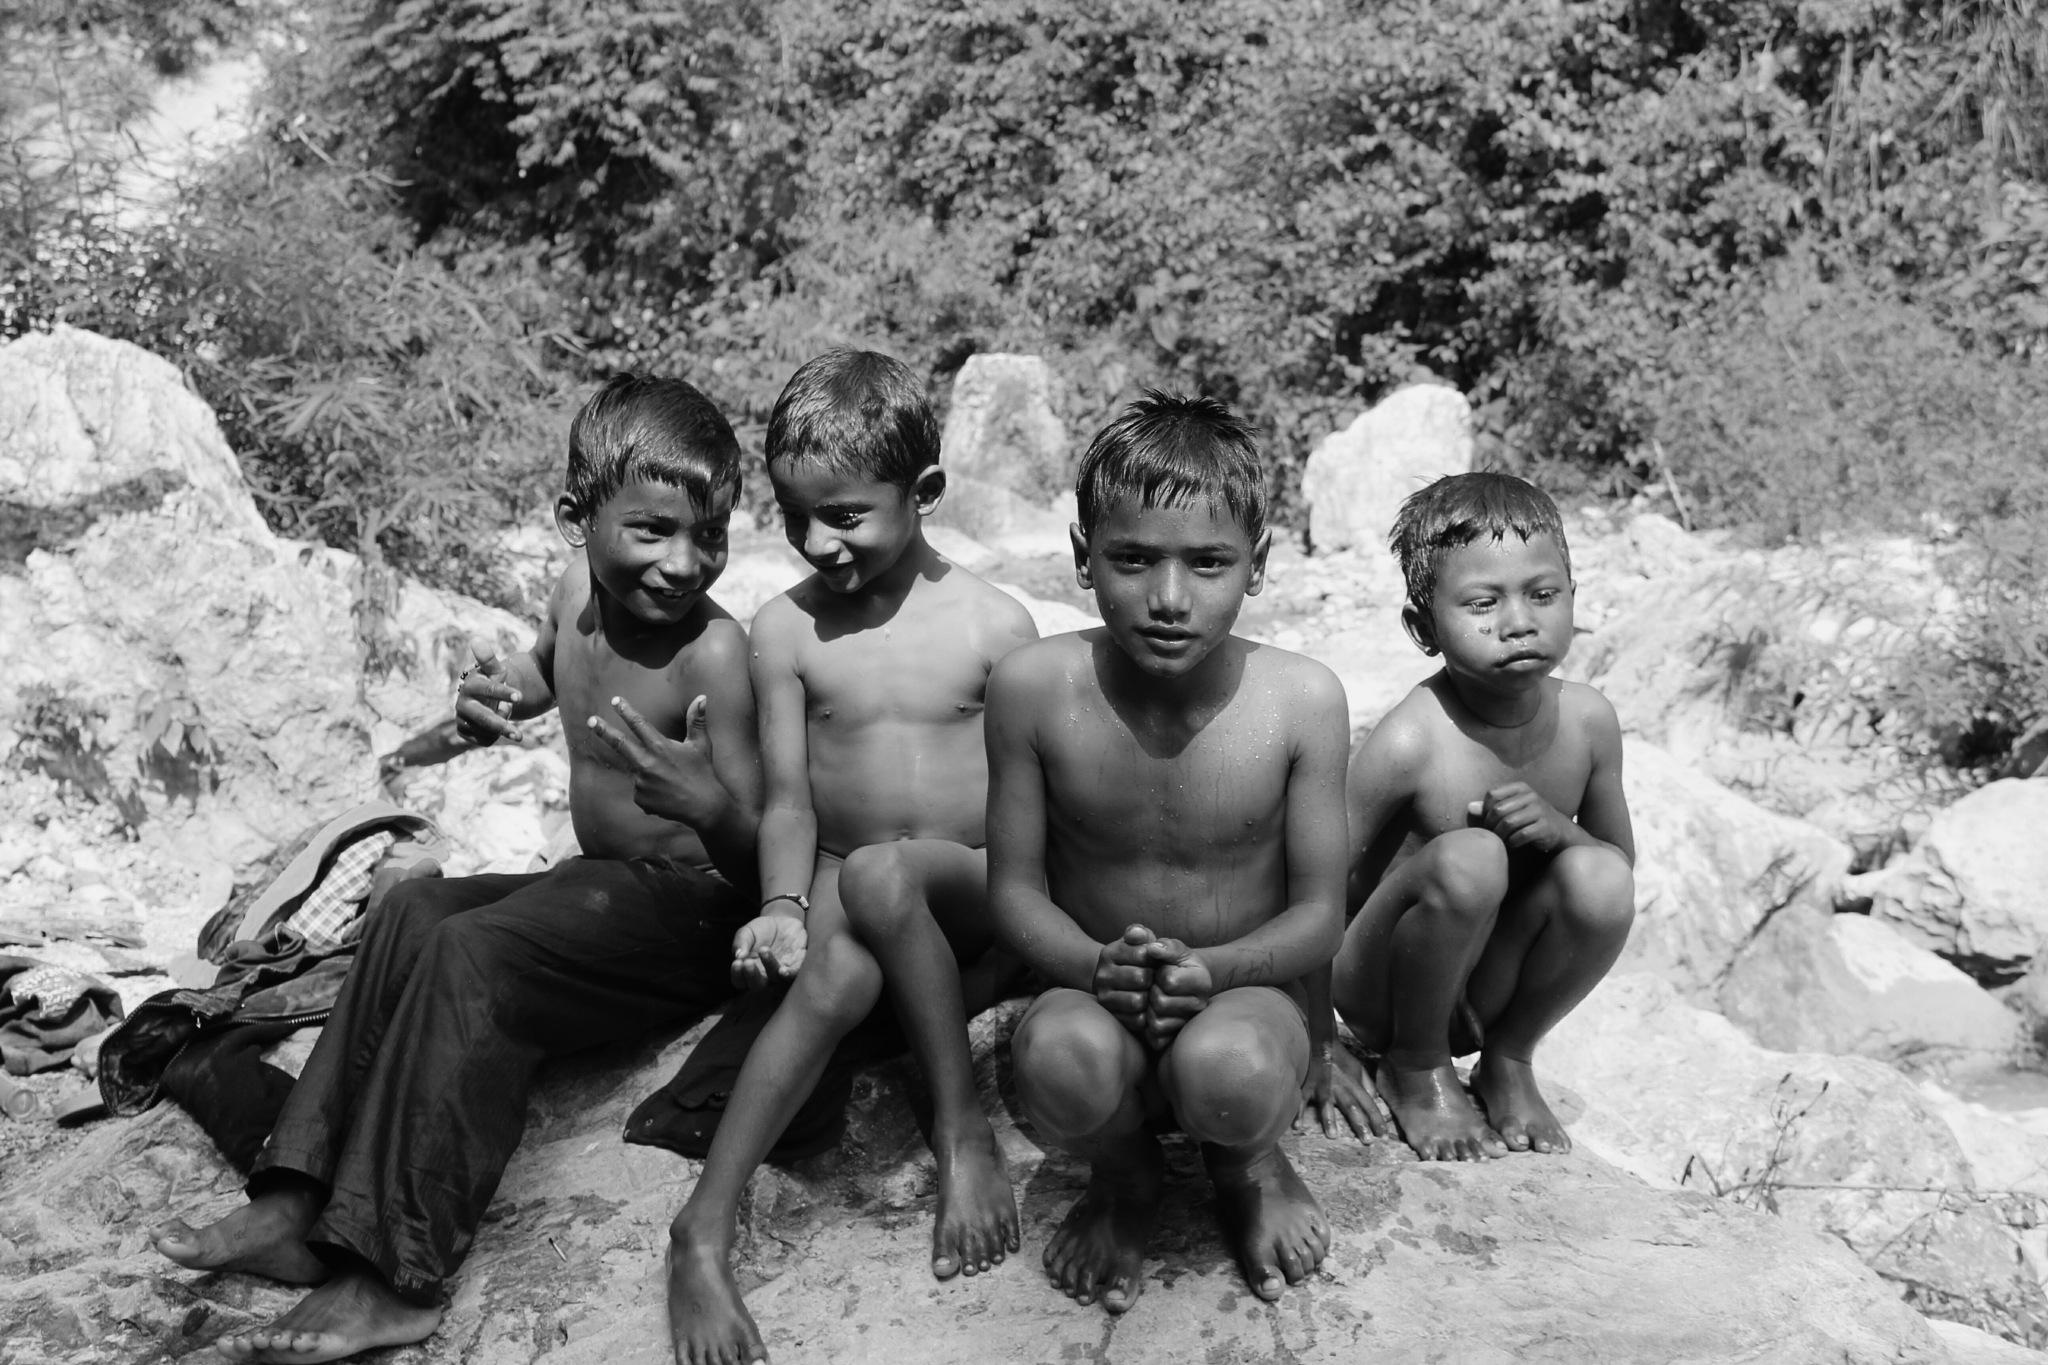 The innocent childhood.. by deepak8491